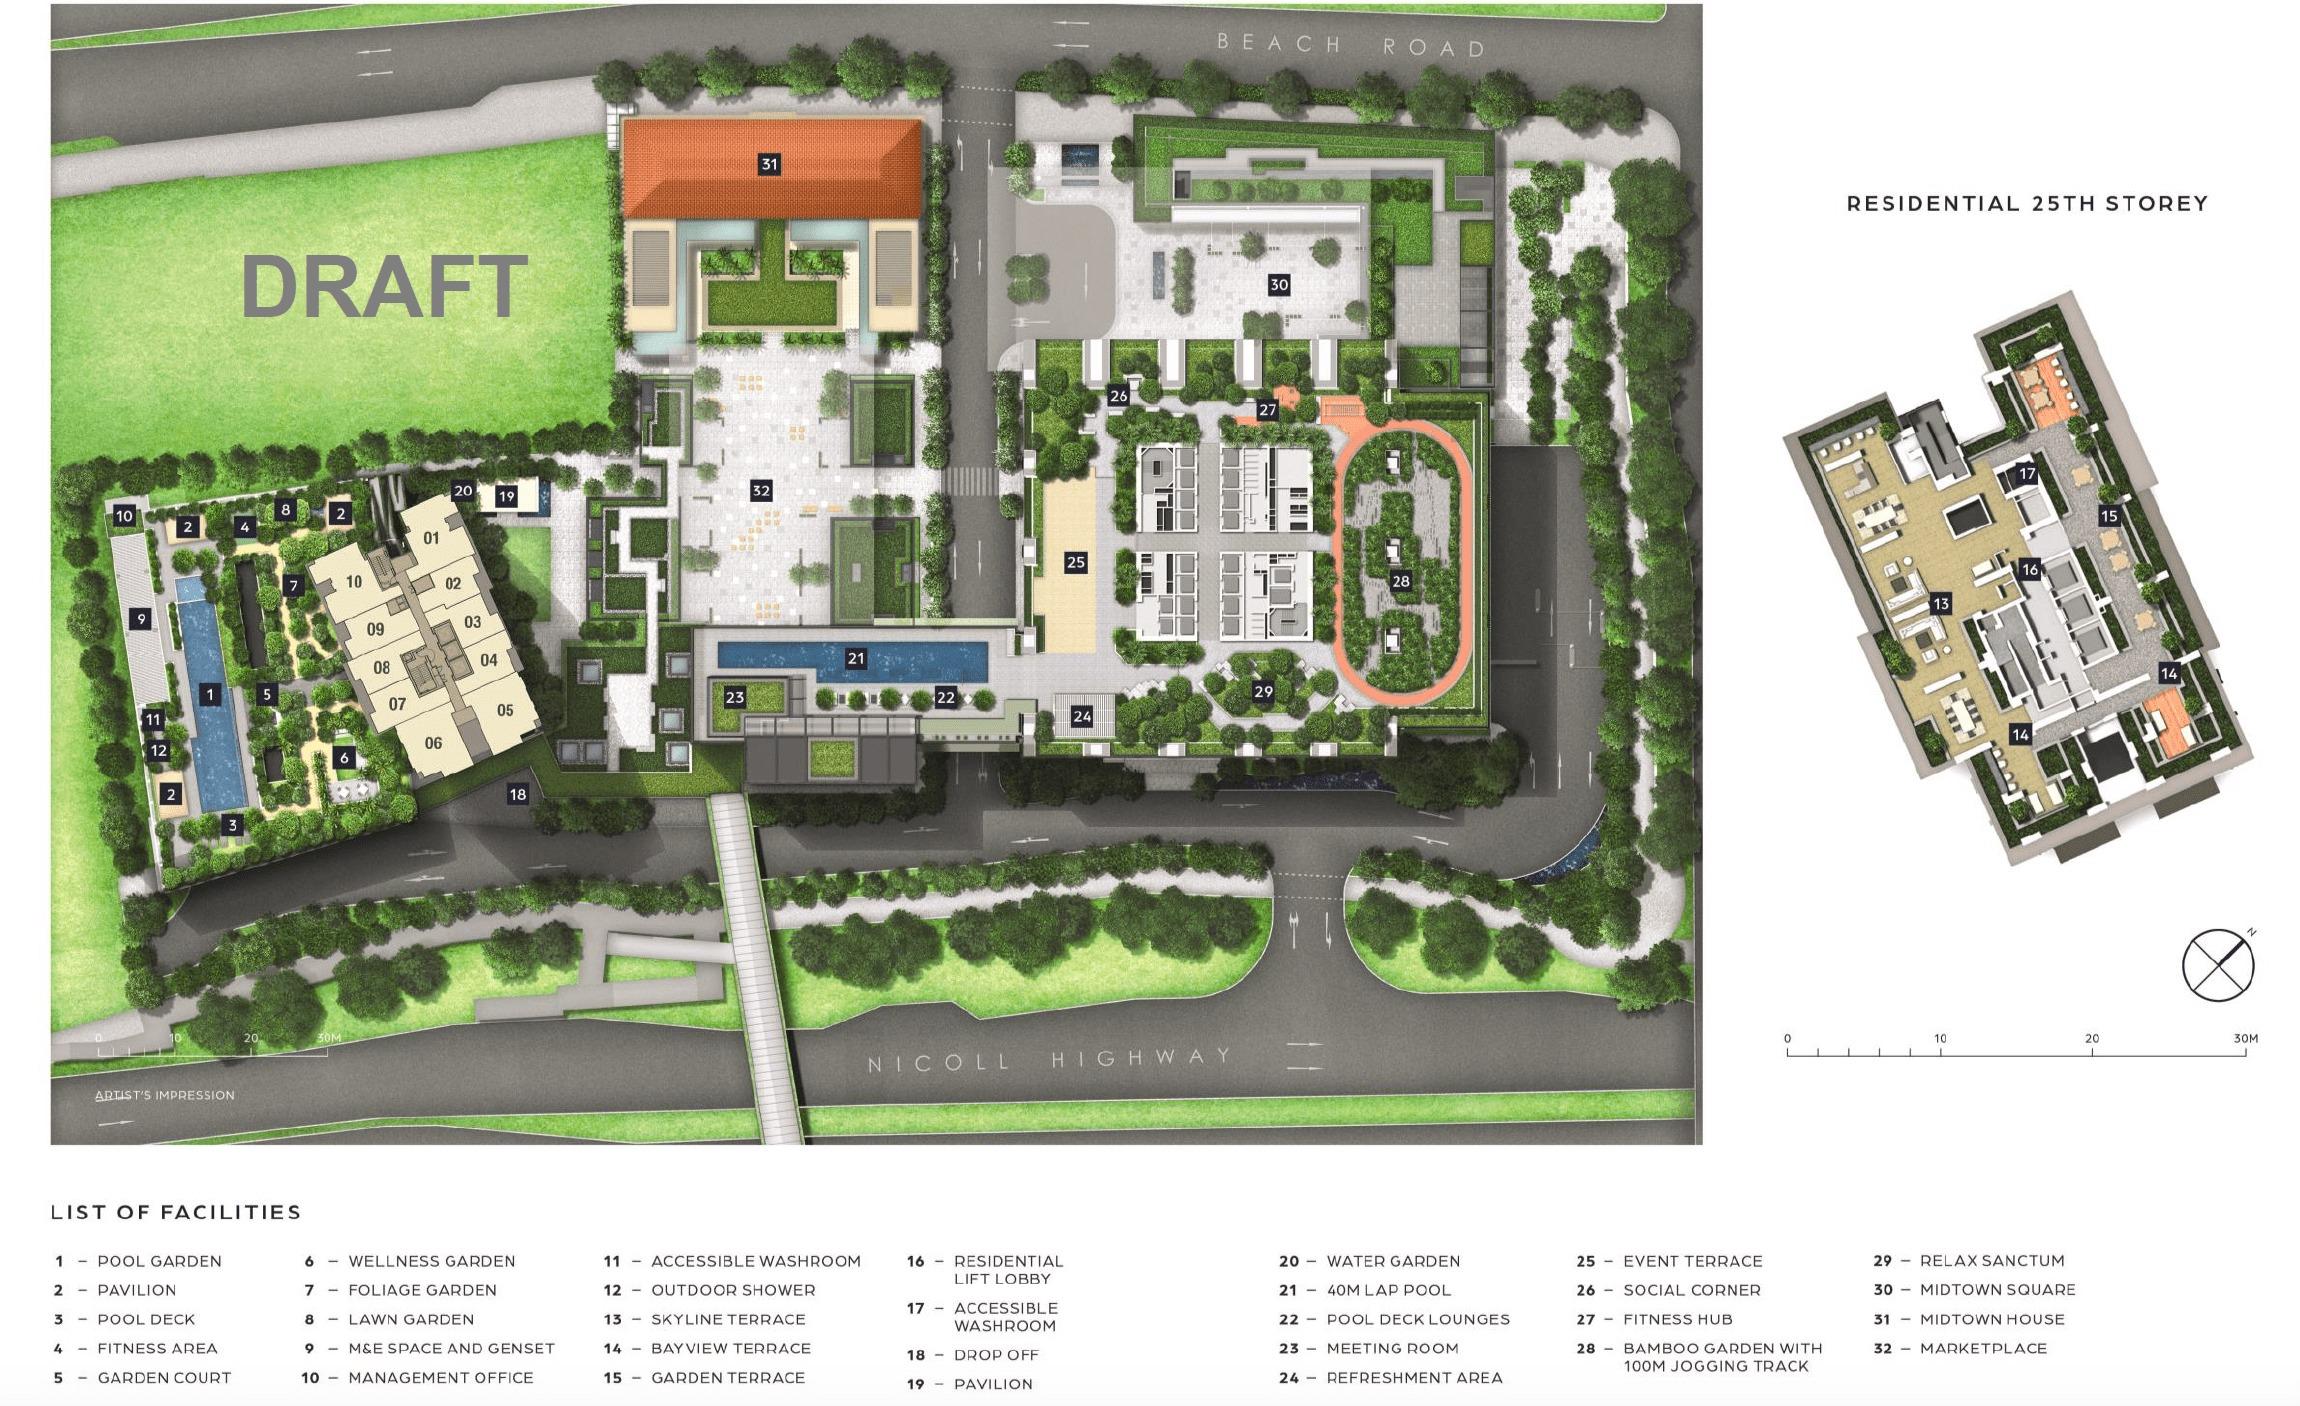 Guoco Midtown Bay draft site plan